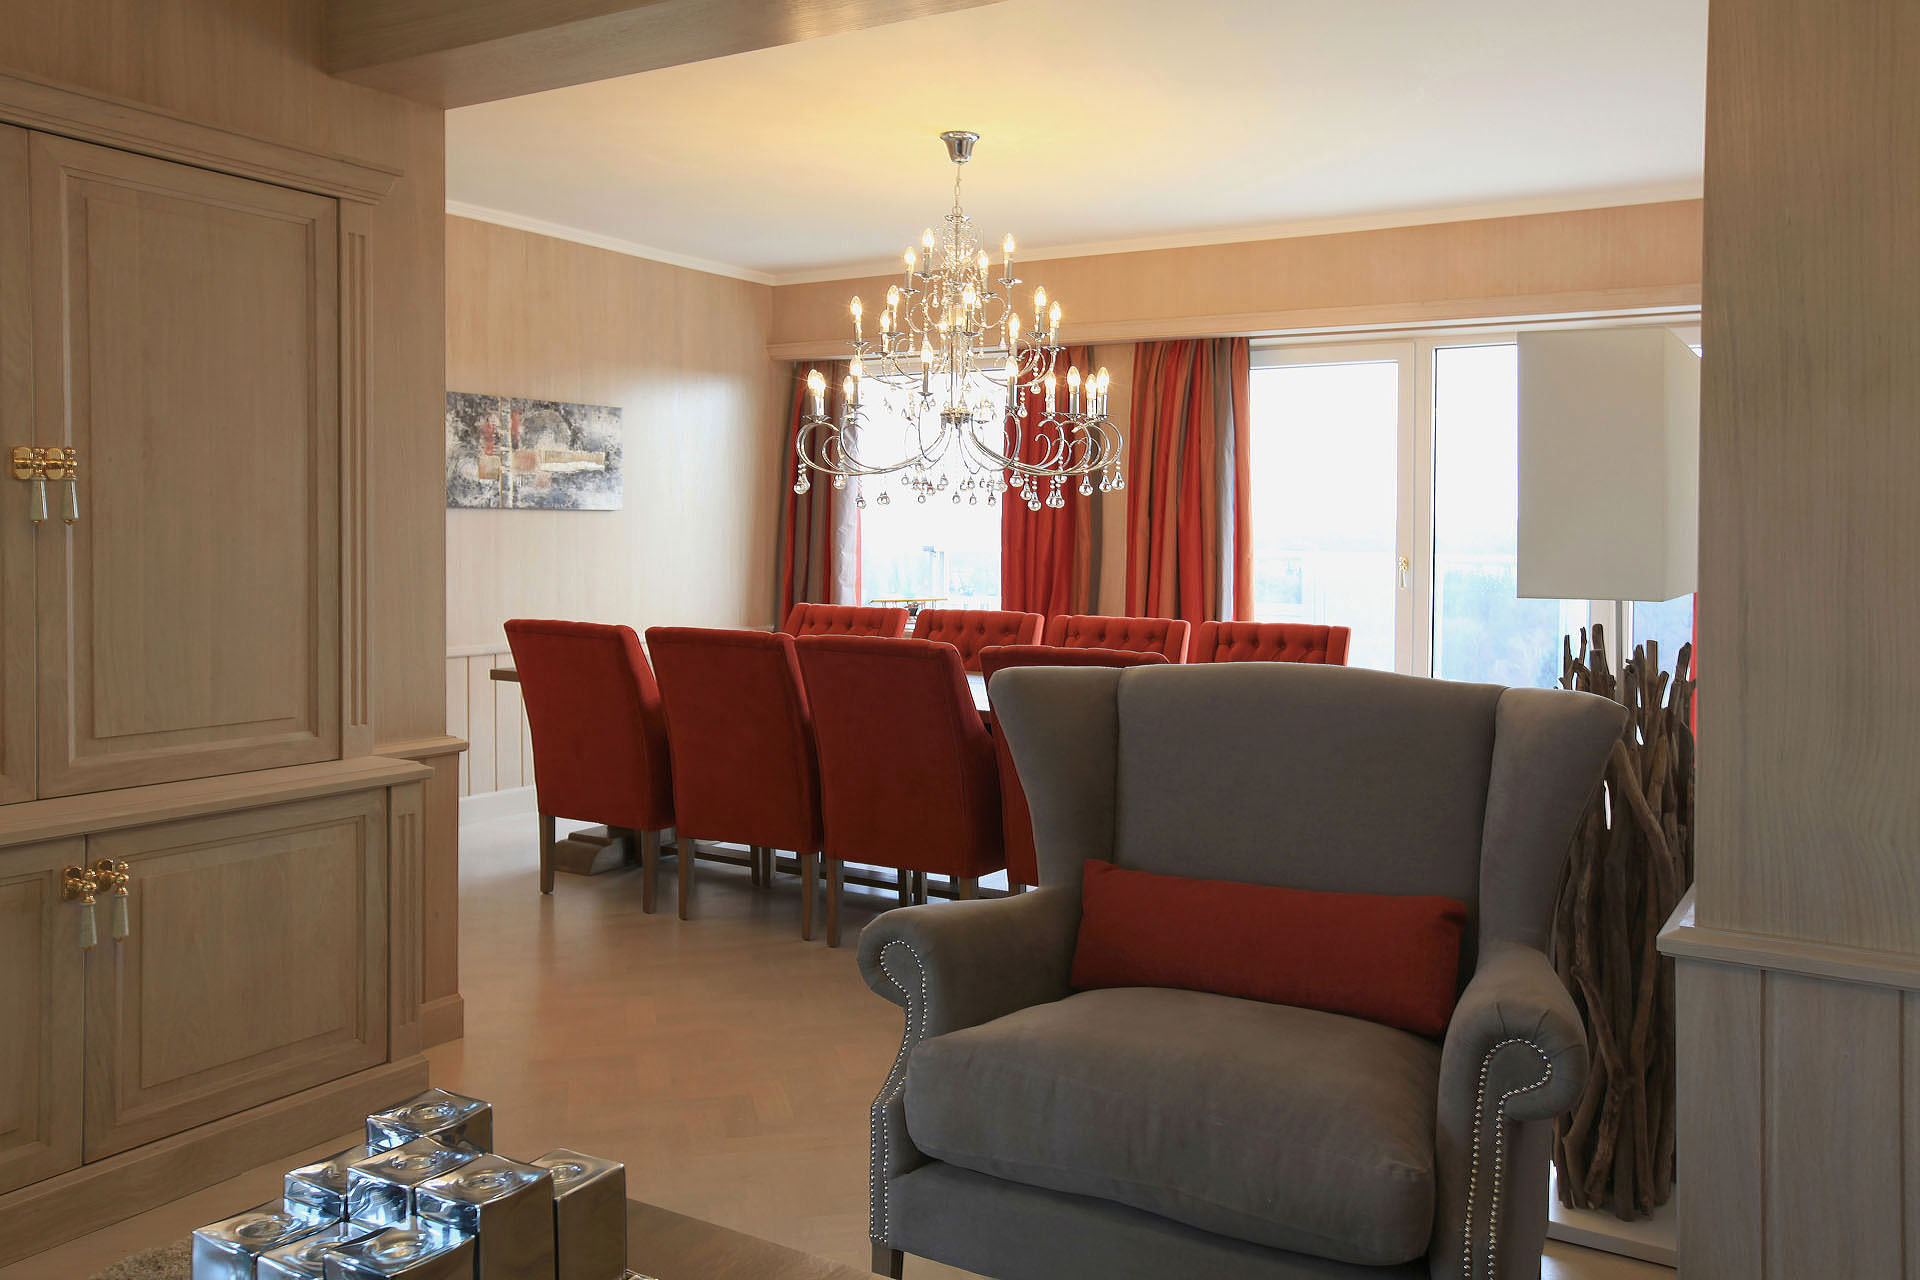 Penthouse strak landelijke stijl - Marcotte Style